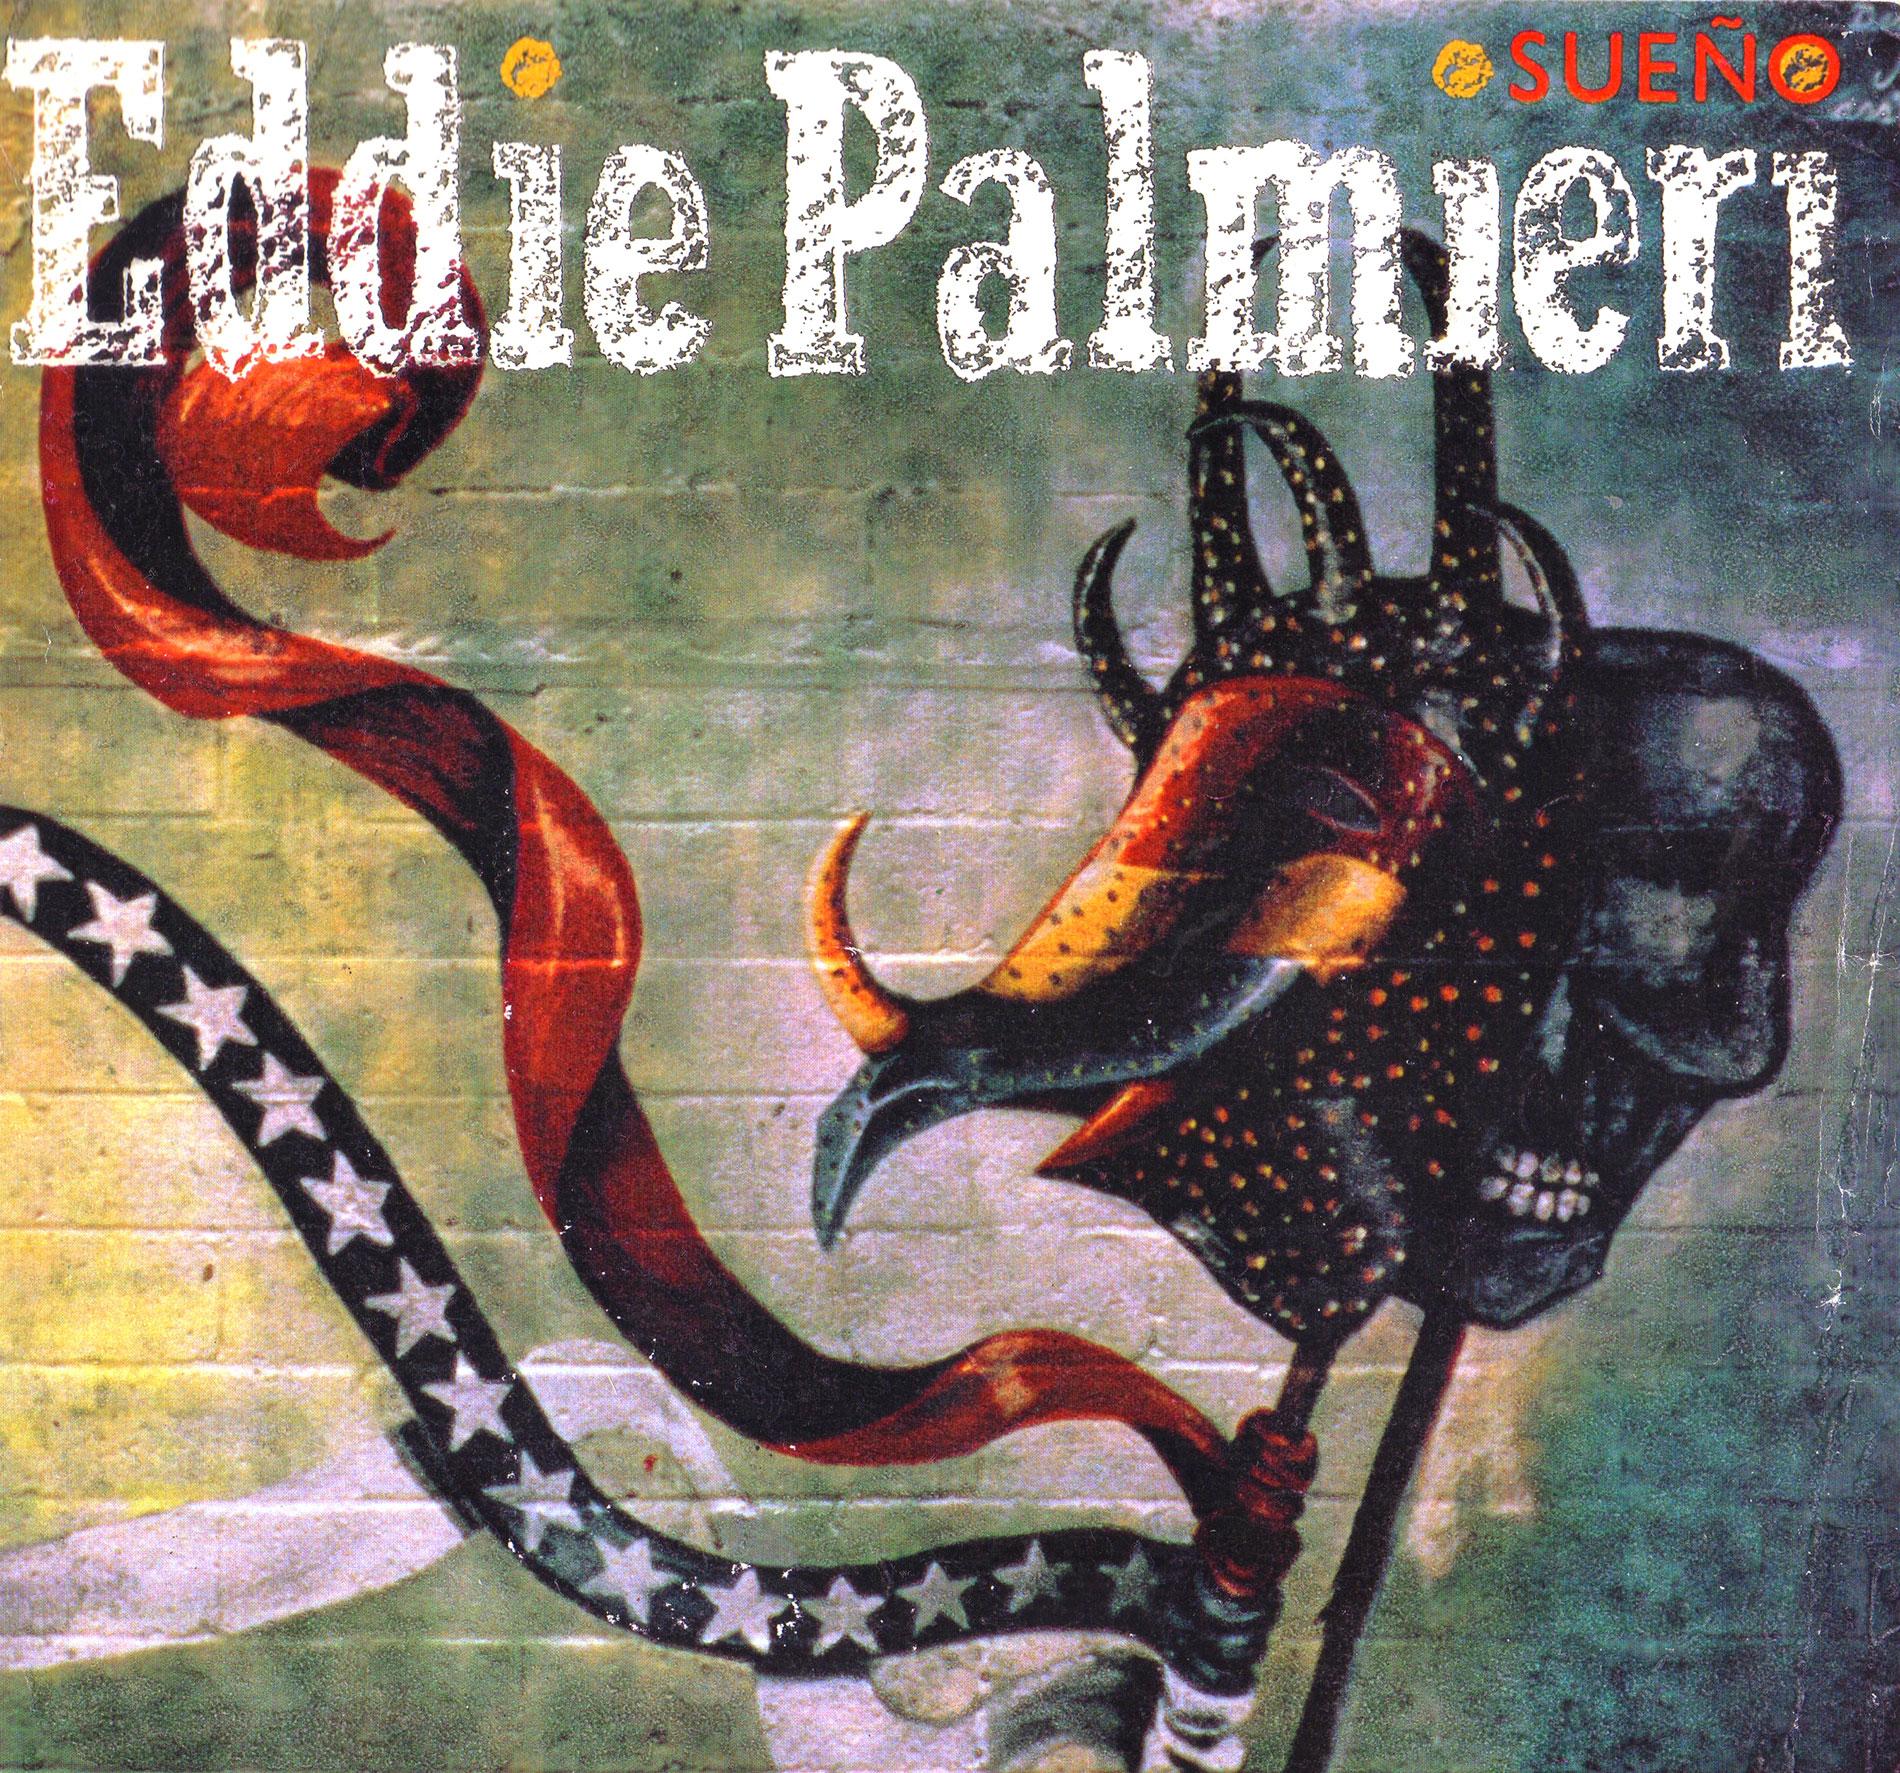 Eddie Palmieri record cover   Courtesy of Maria Dominguez